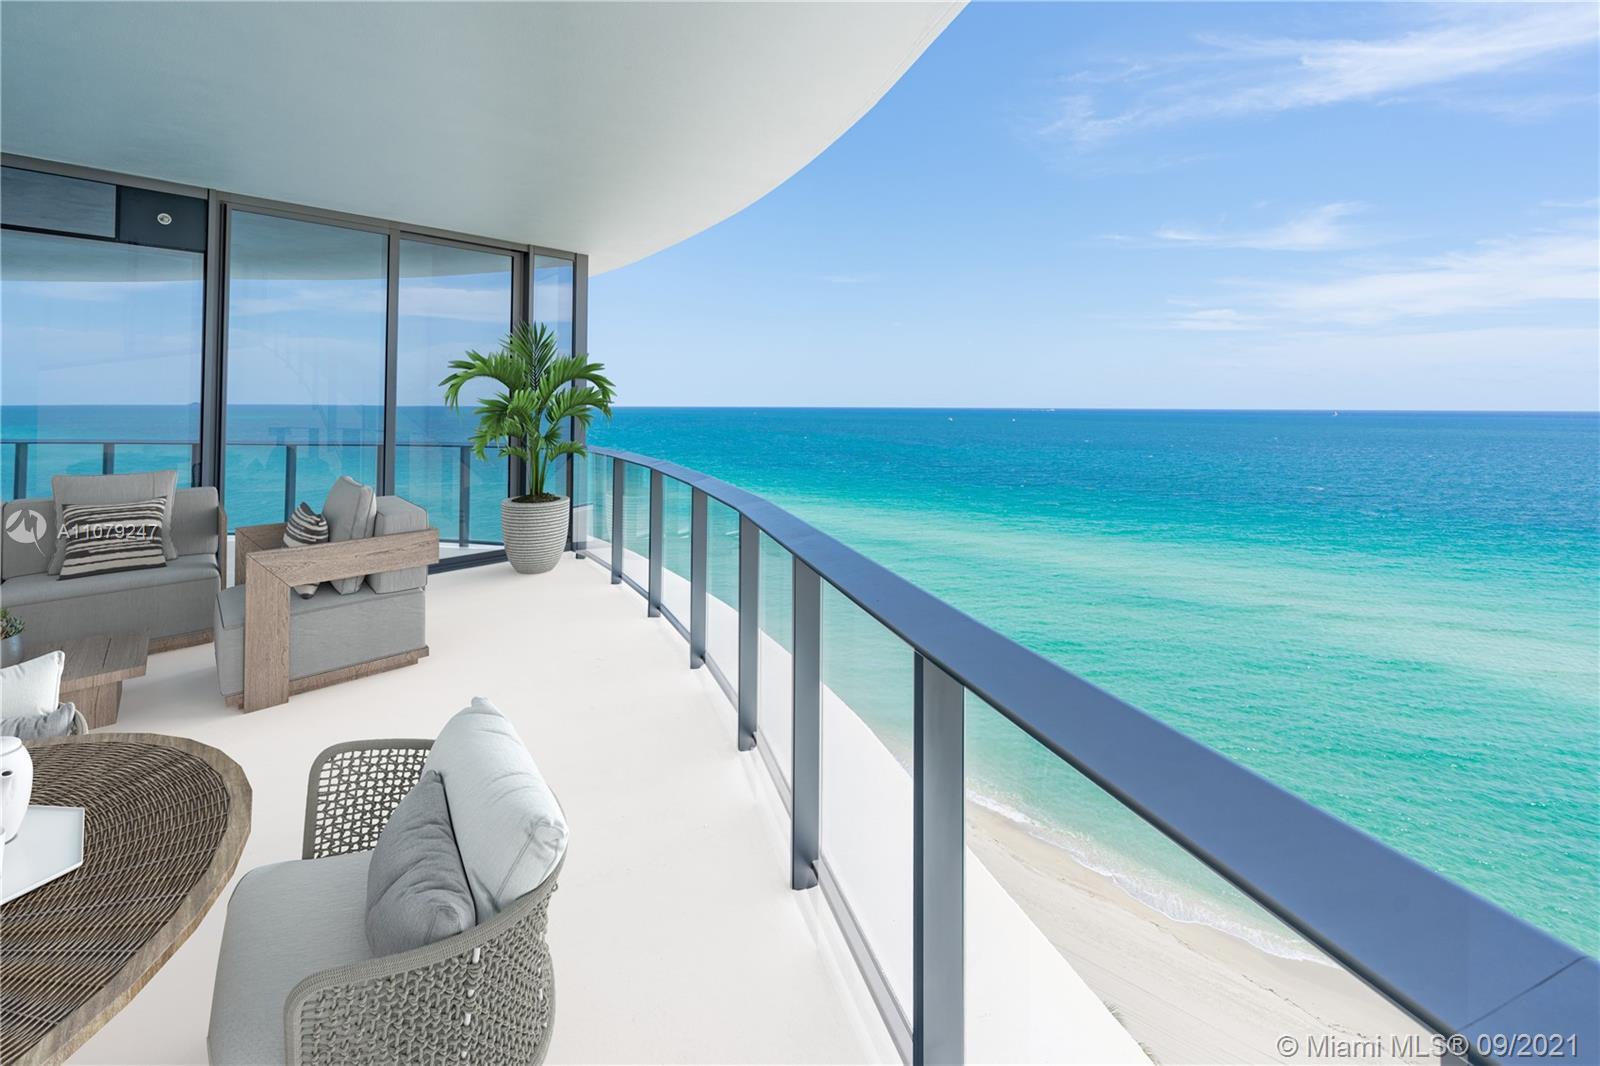 15701 Collins Ave Unit 802, Sunny Isles Beach, Florida 33160